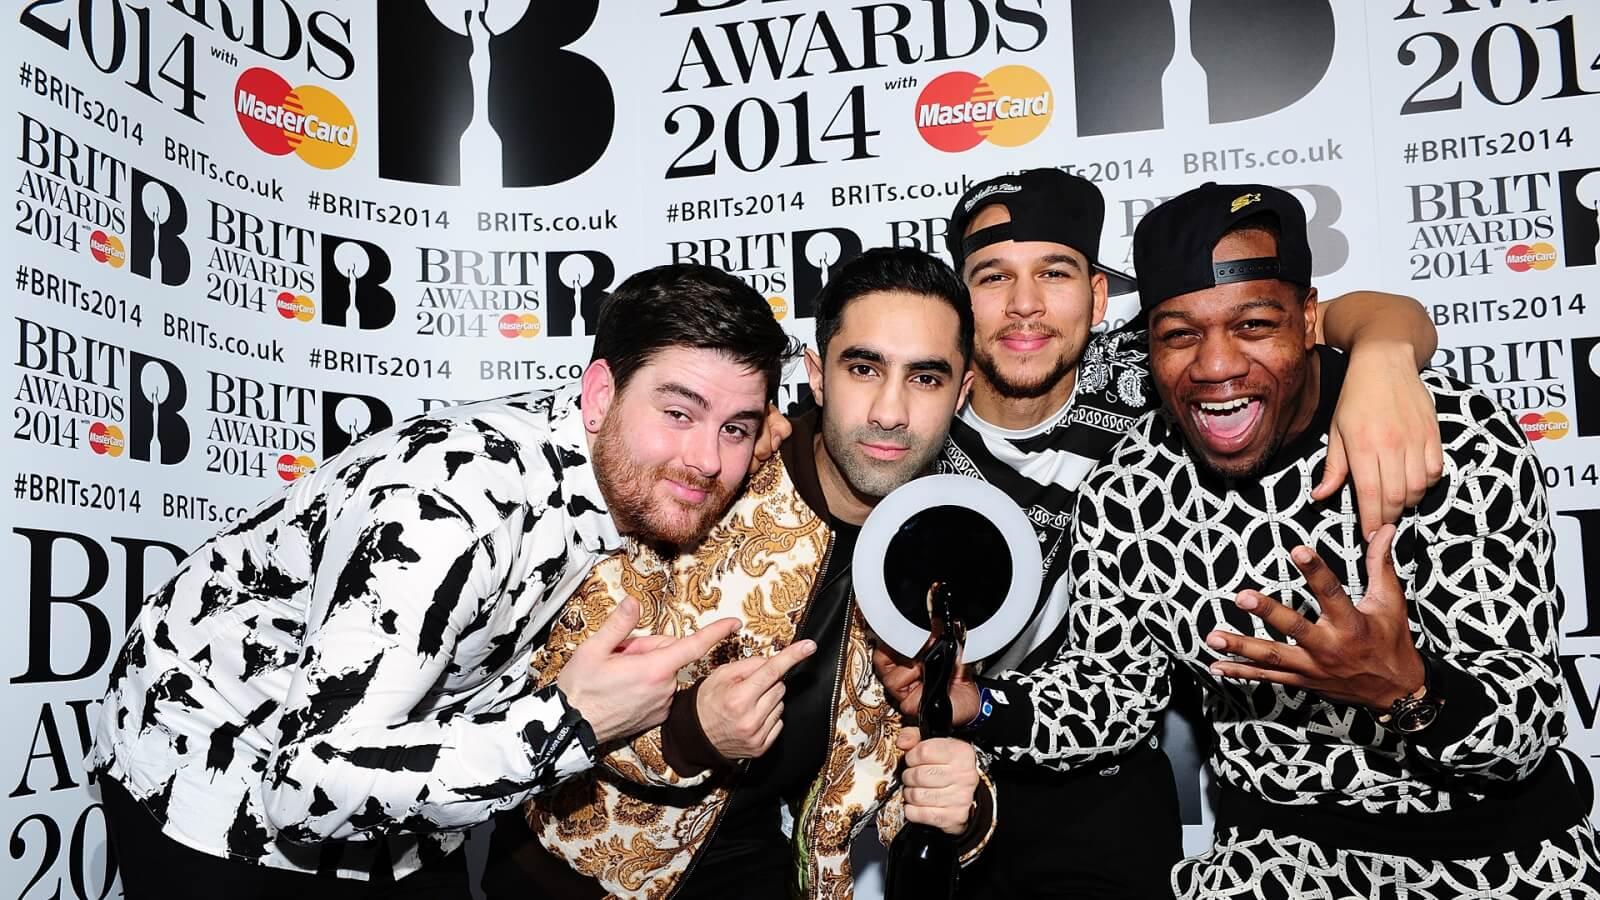 03 Brit Awards Logo 2014 Rudimental